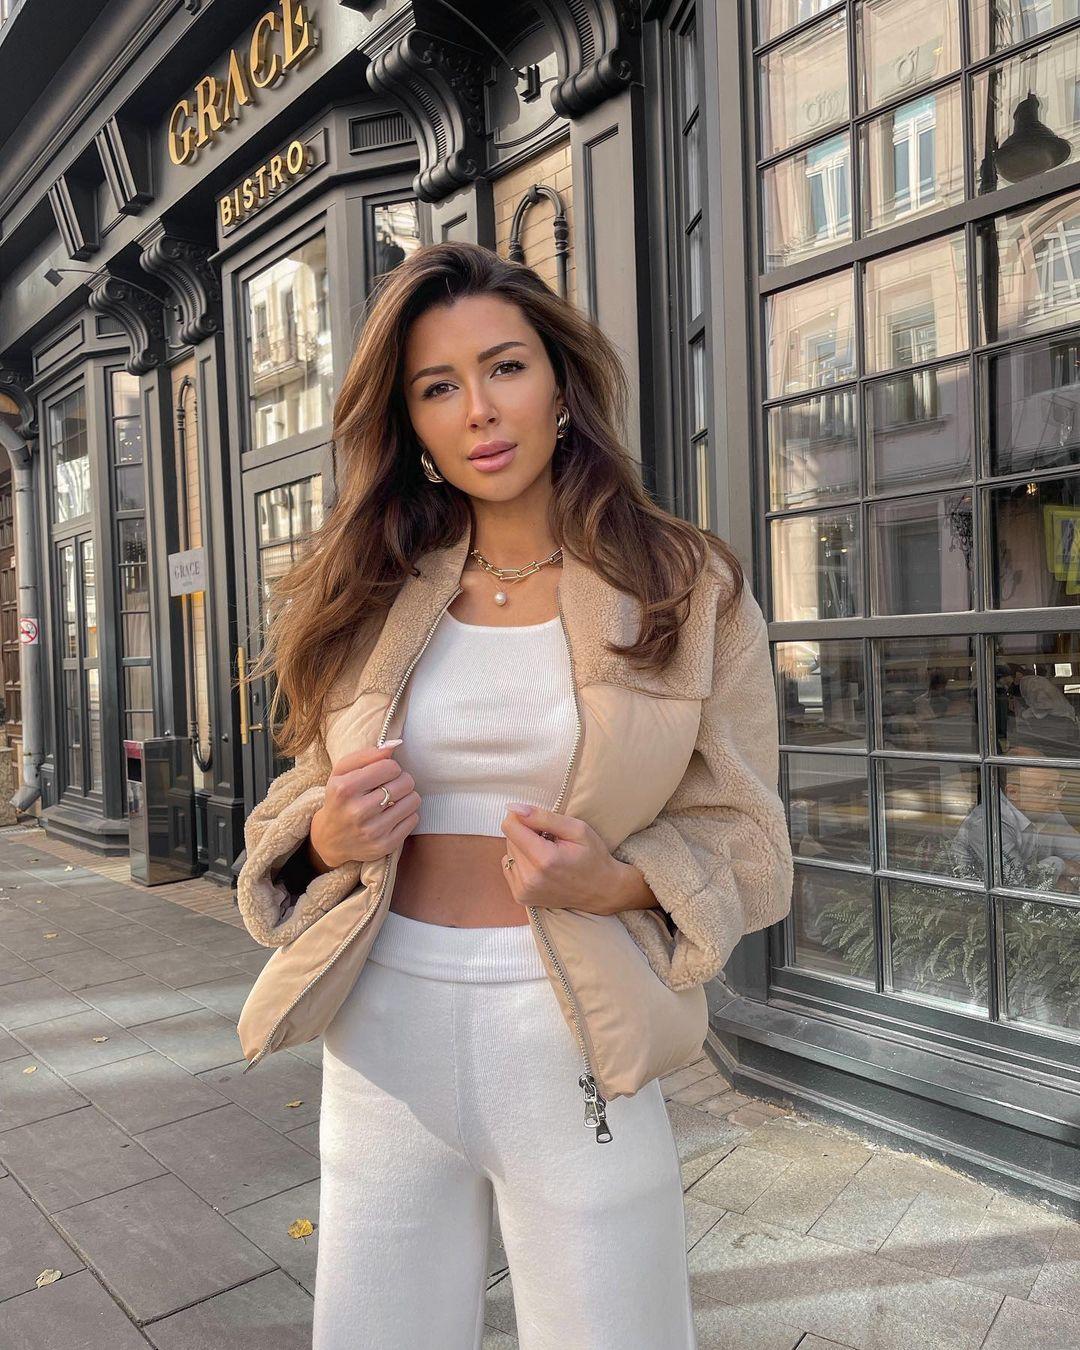 Anna Zavorotnyuk was glad to the gained pounds